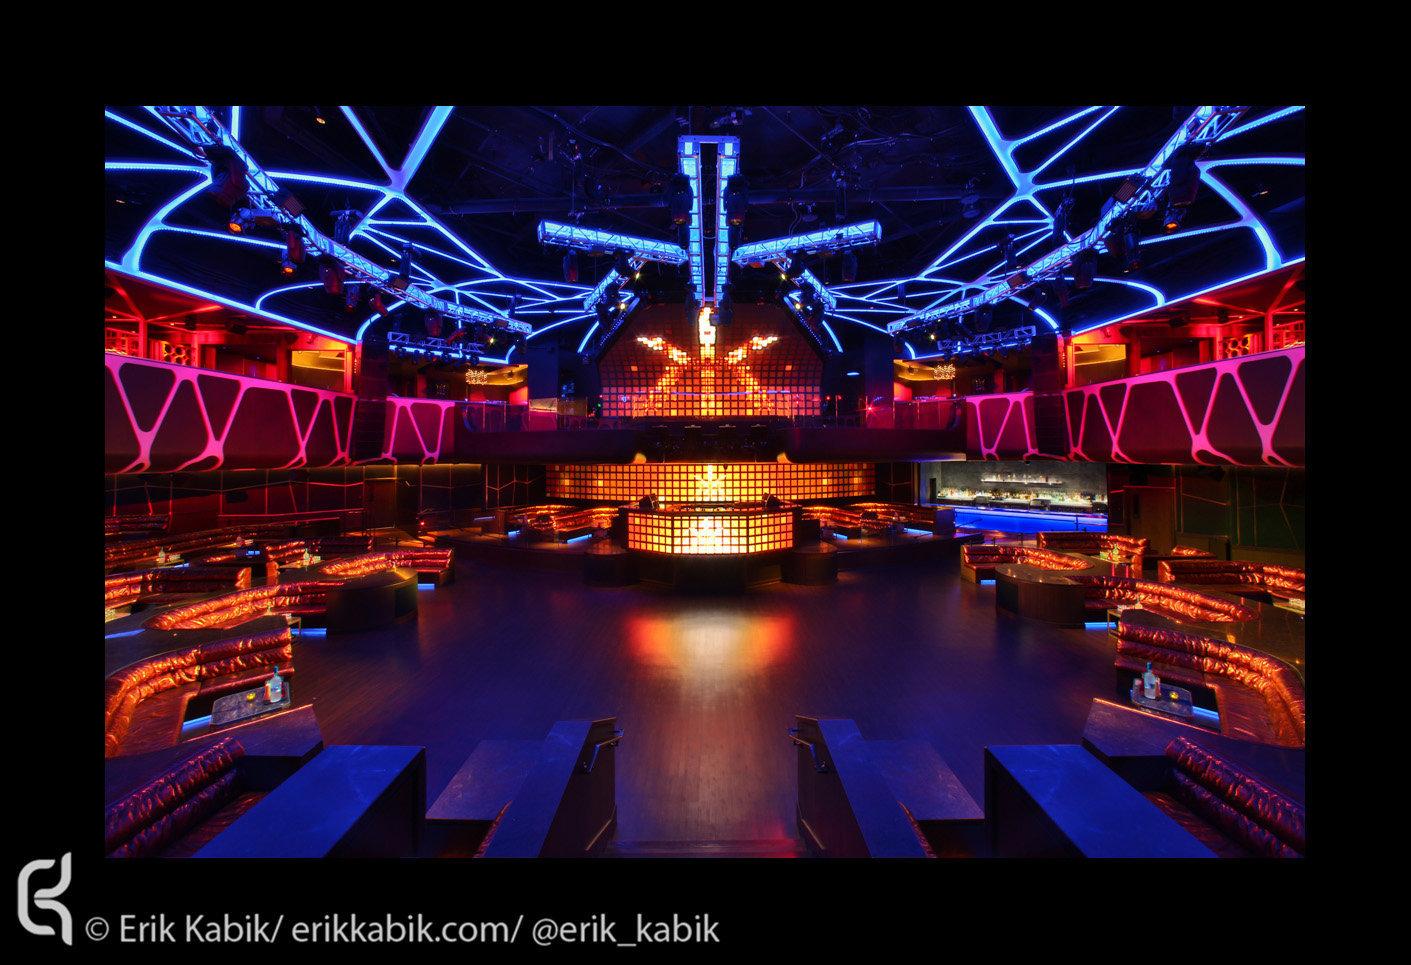 5_31_13_hakkasan_architecture_kabik-12_122_combo_B-3.jpg